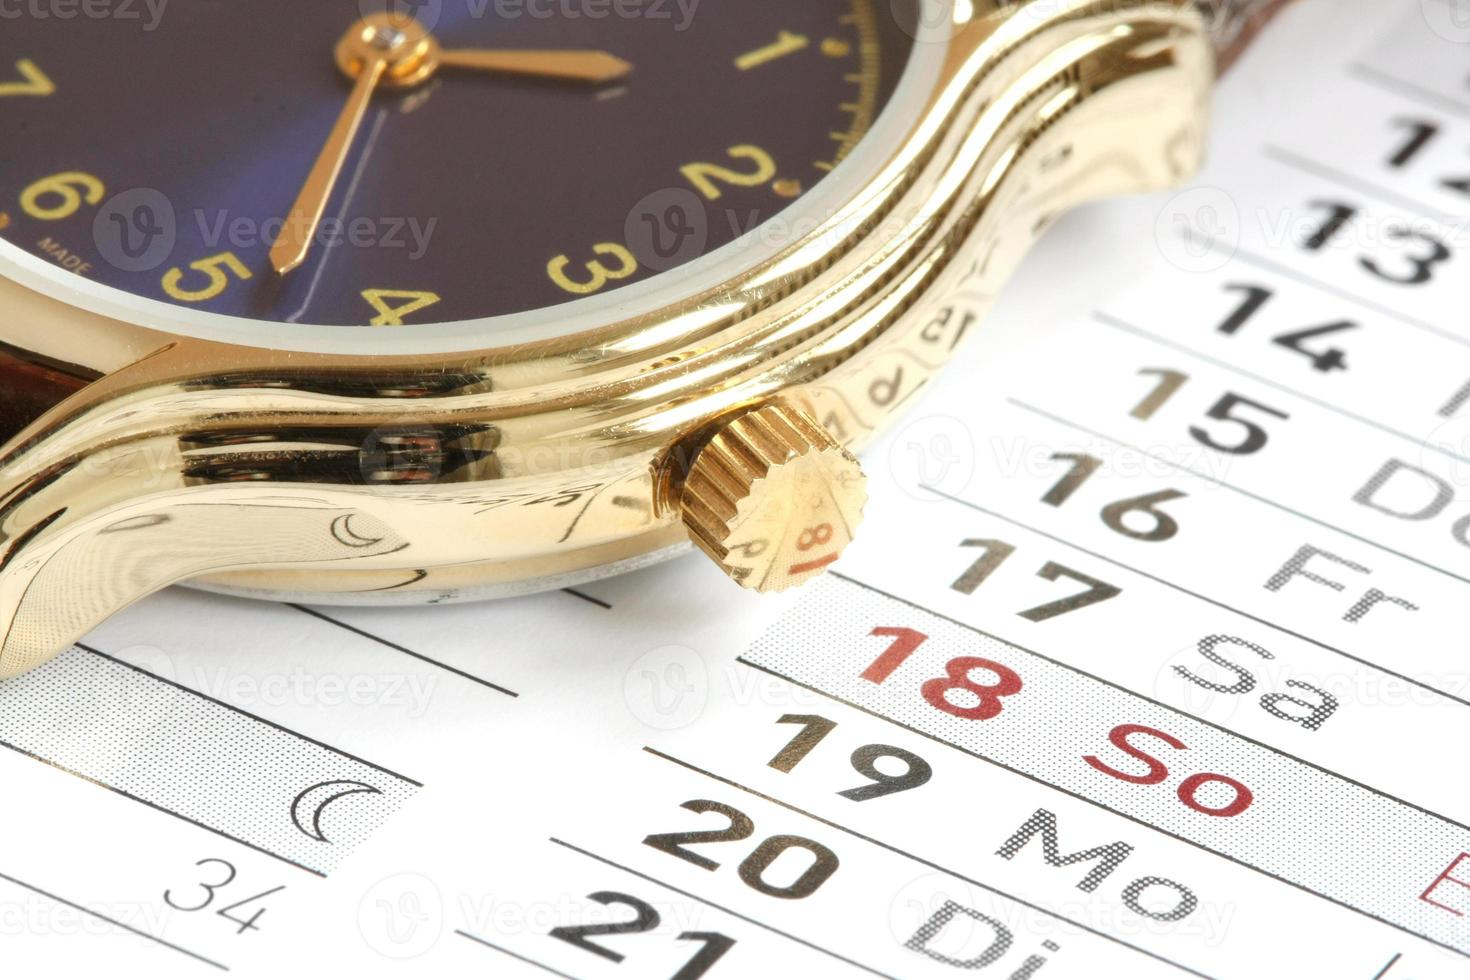 armbandsur på kalenderbakgrunden foto